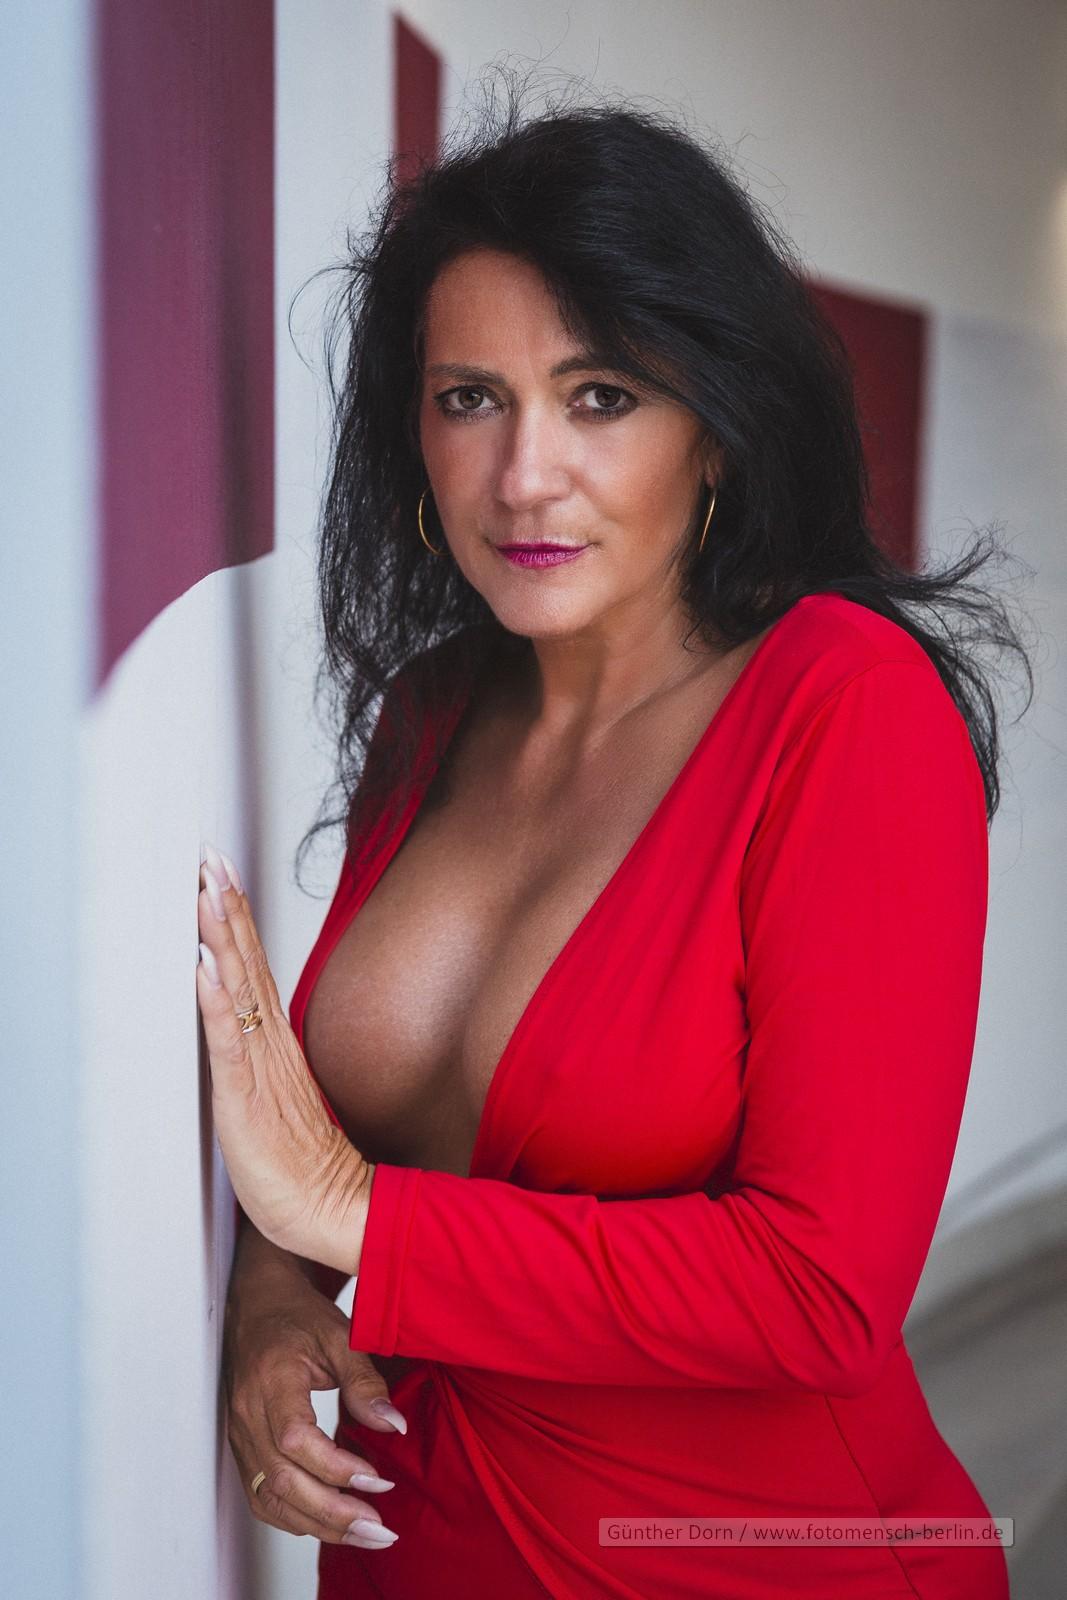 Svea im roten Kleid